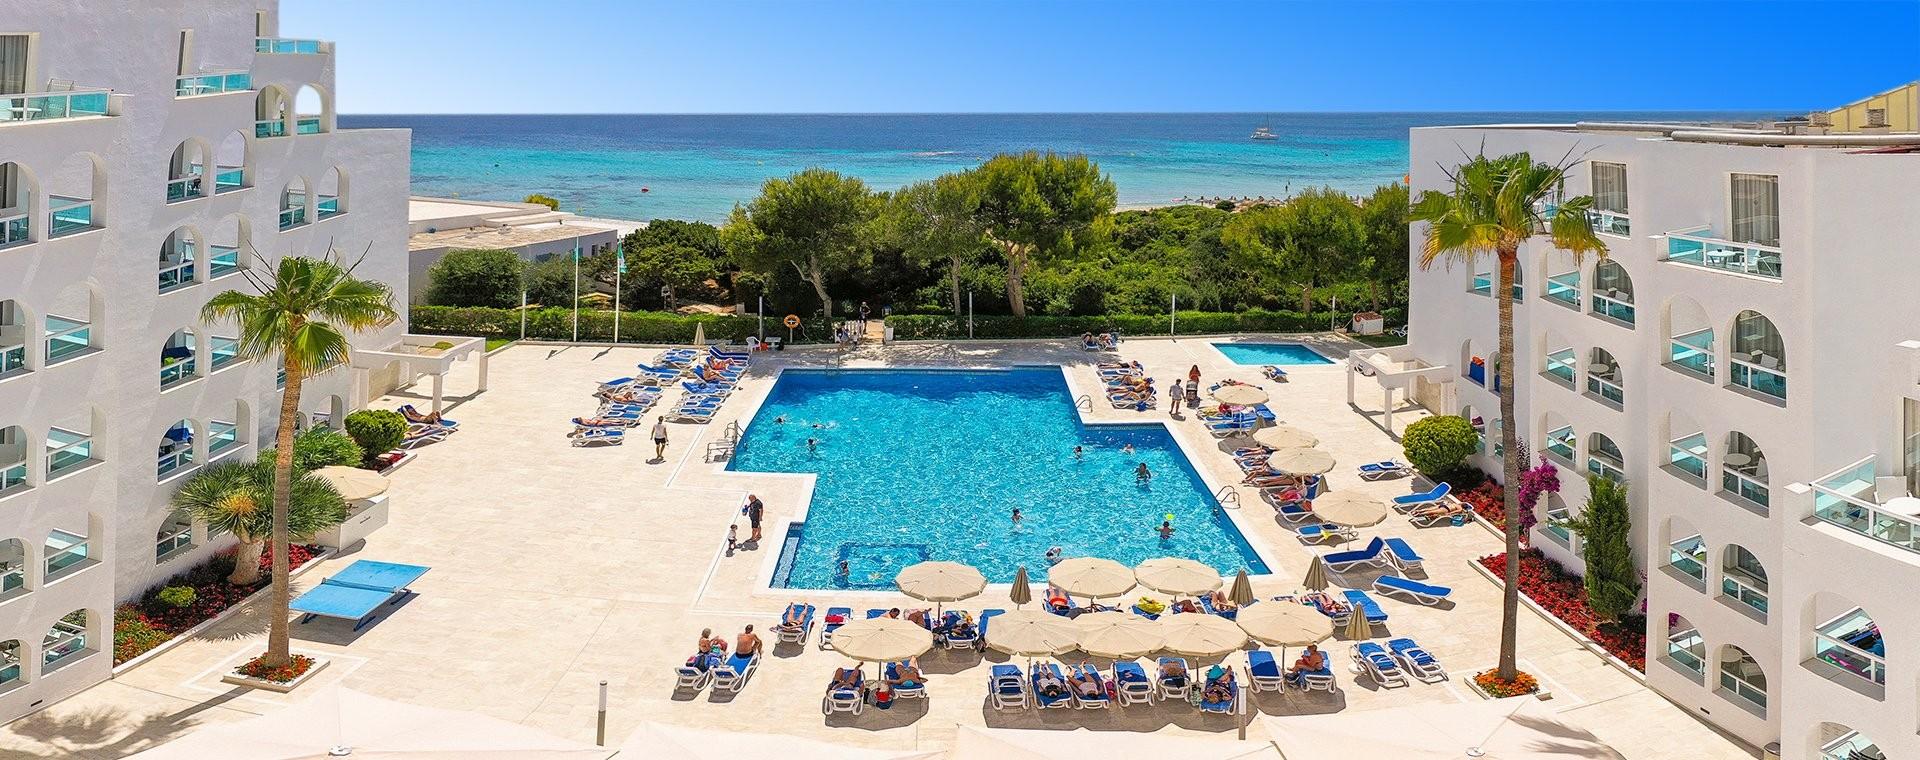 MINORCA: Veraclub Menorca